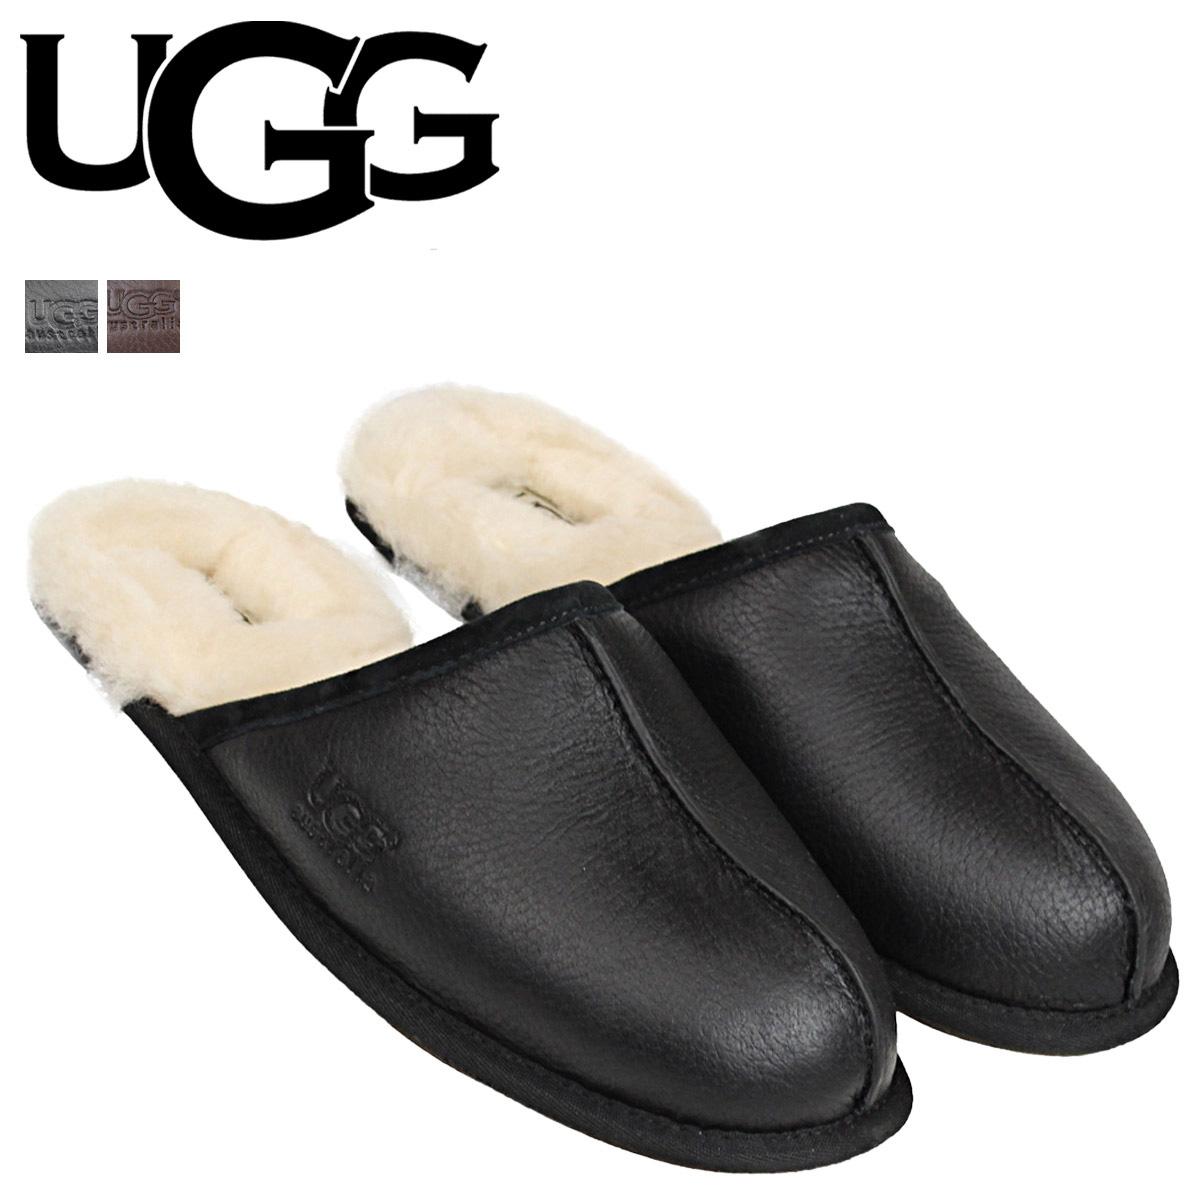 e5a7b429906 UGG UGG men's Scuff Slippers MENS SCUFF 1001546